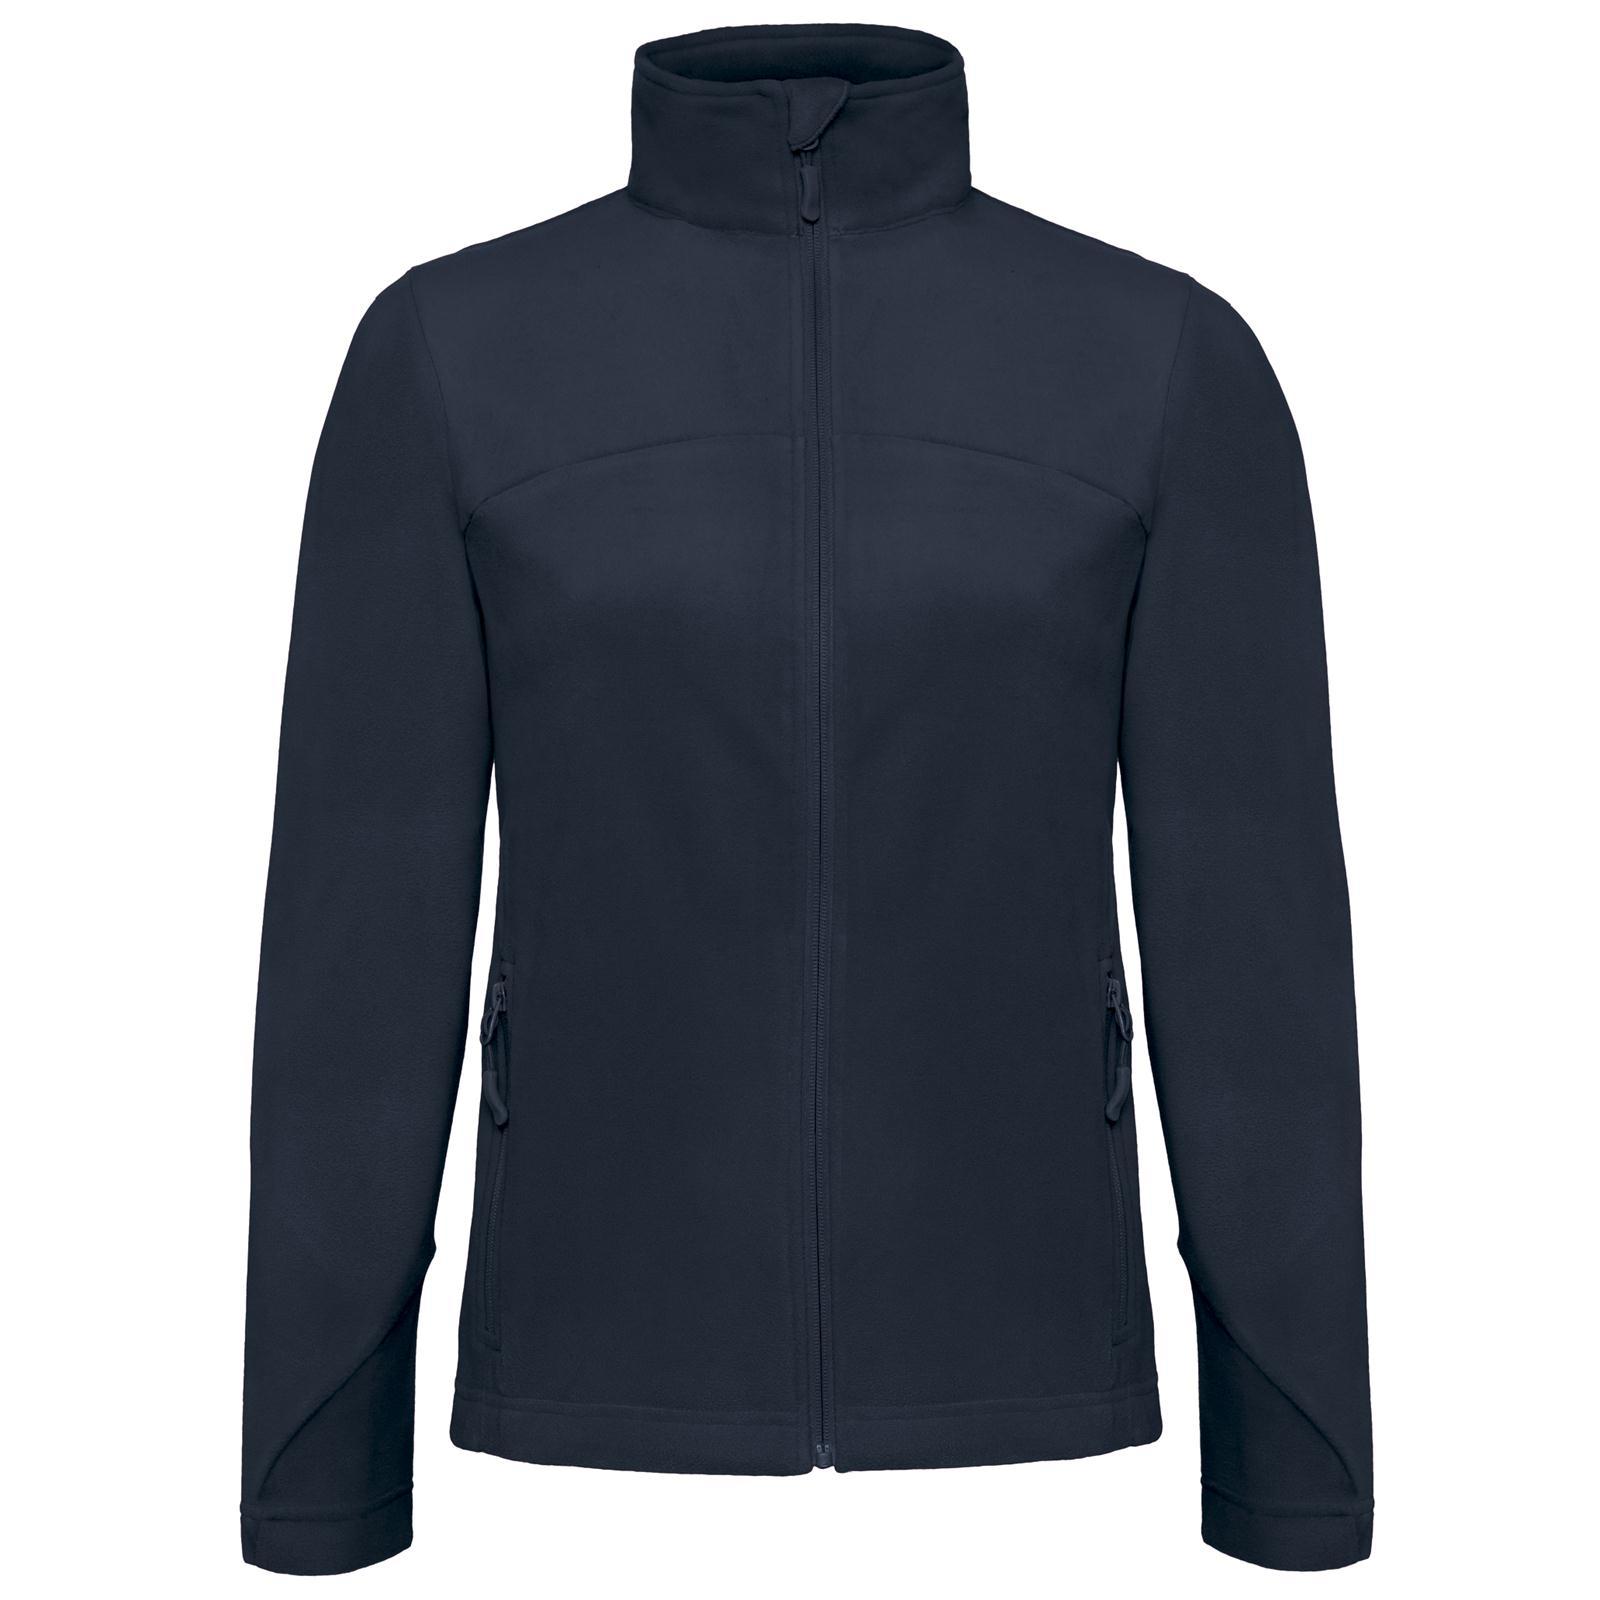 B C Womens Ladies Coolstar Soft Zip up Fleece Jacket in 4 Colours XS ... 85ed5b8112